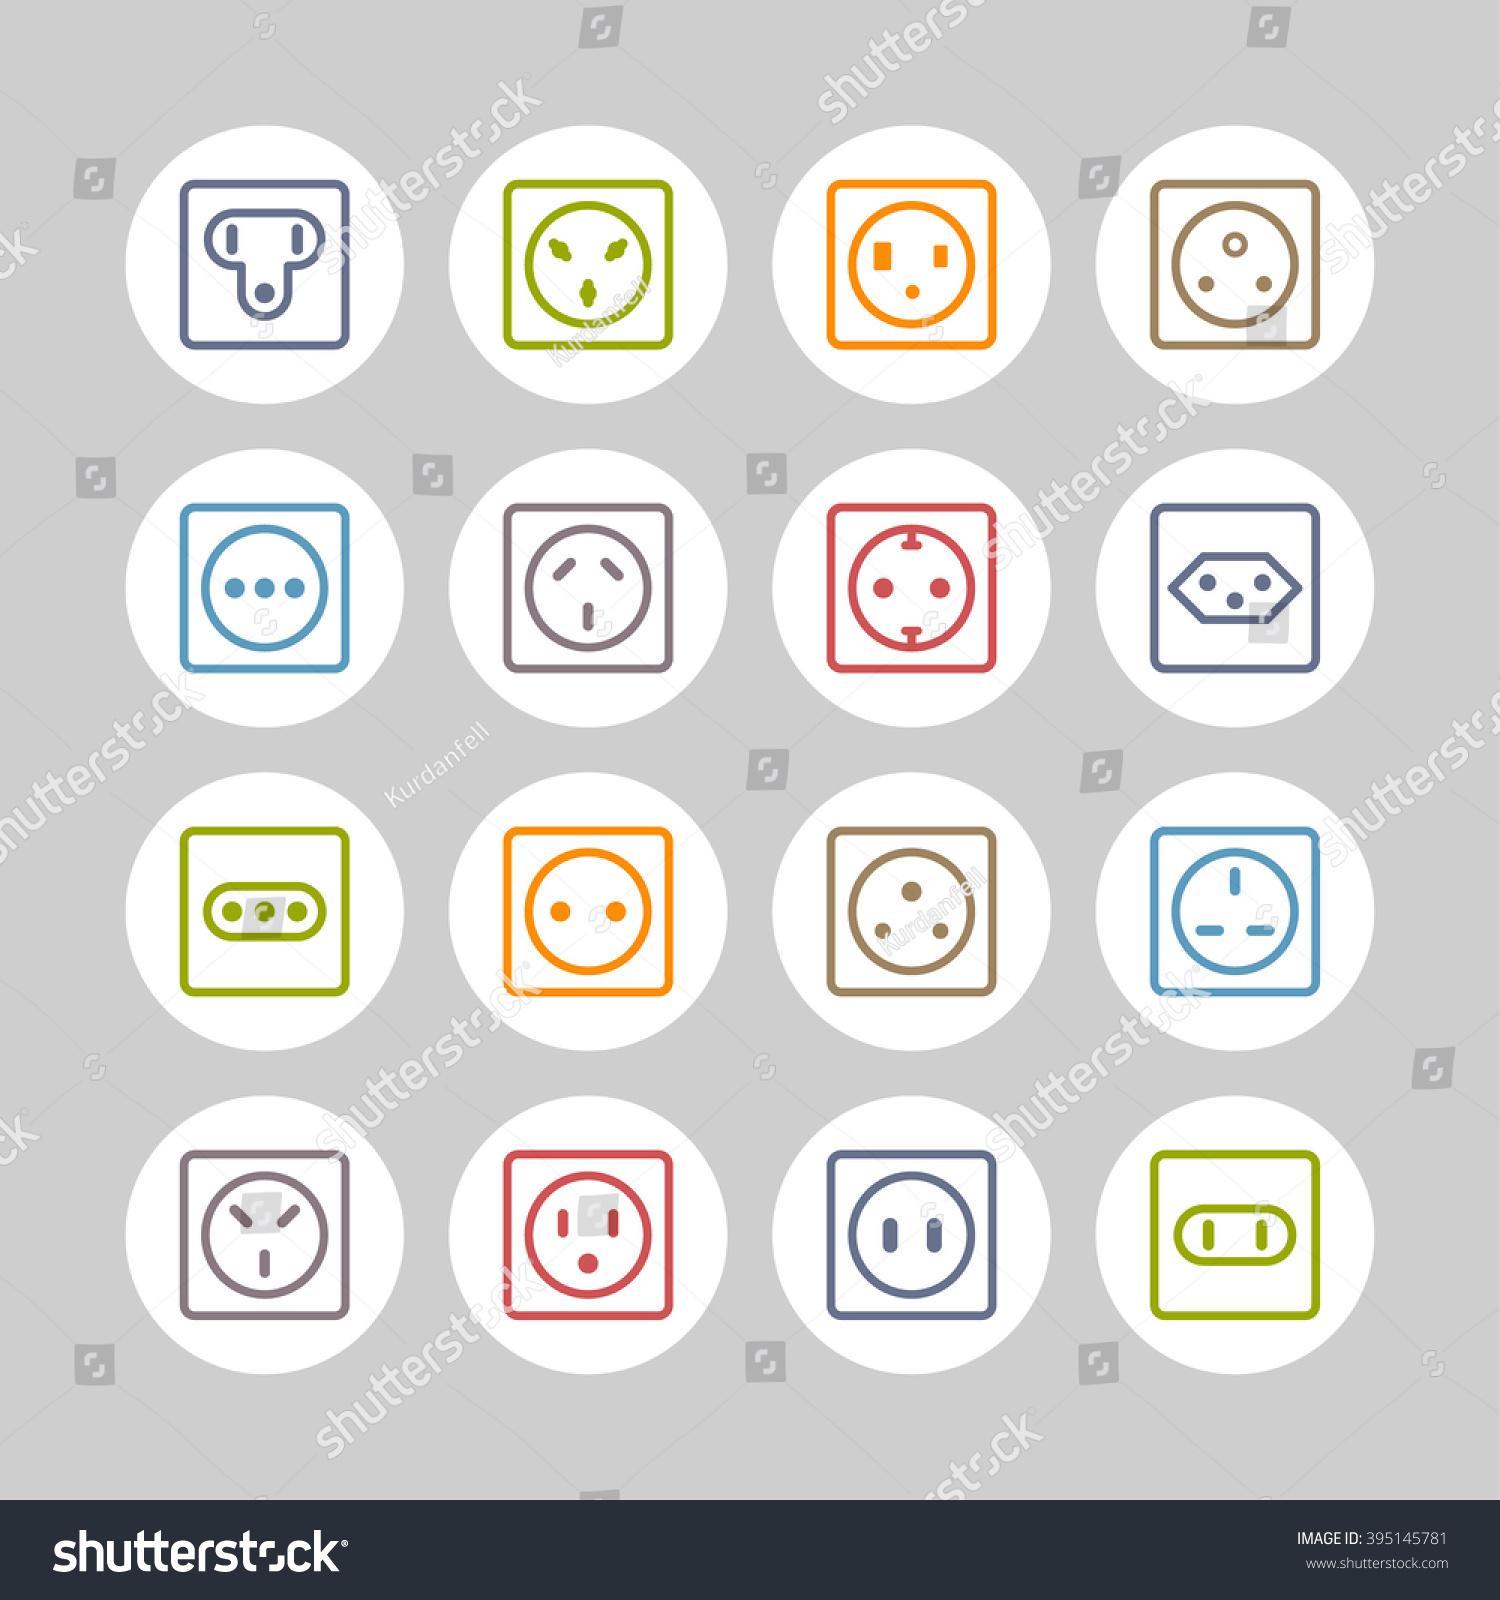 Wiring Diagram For Choke Symbols One Line Electrical Diagram Symbols ...